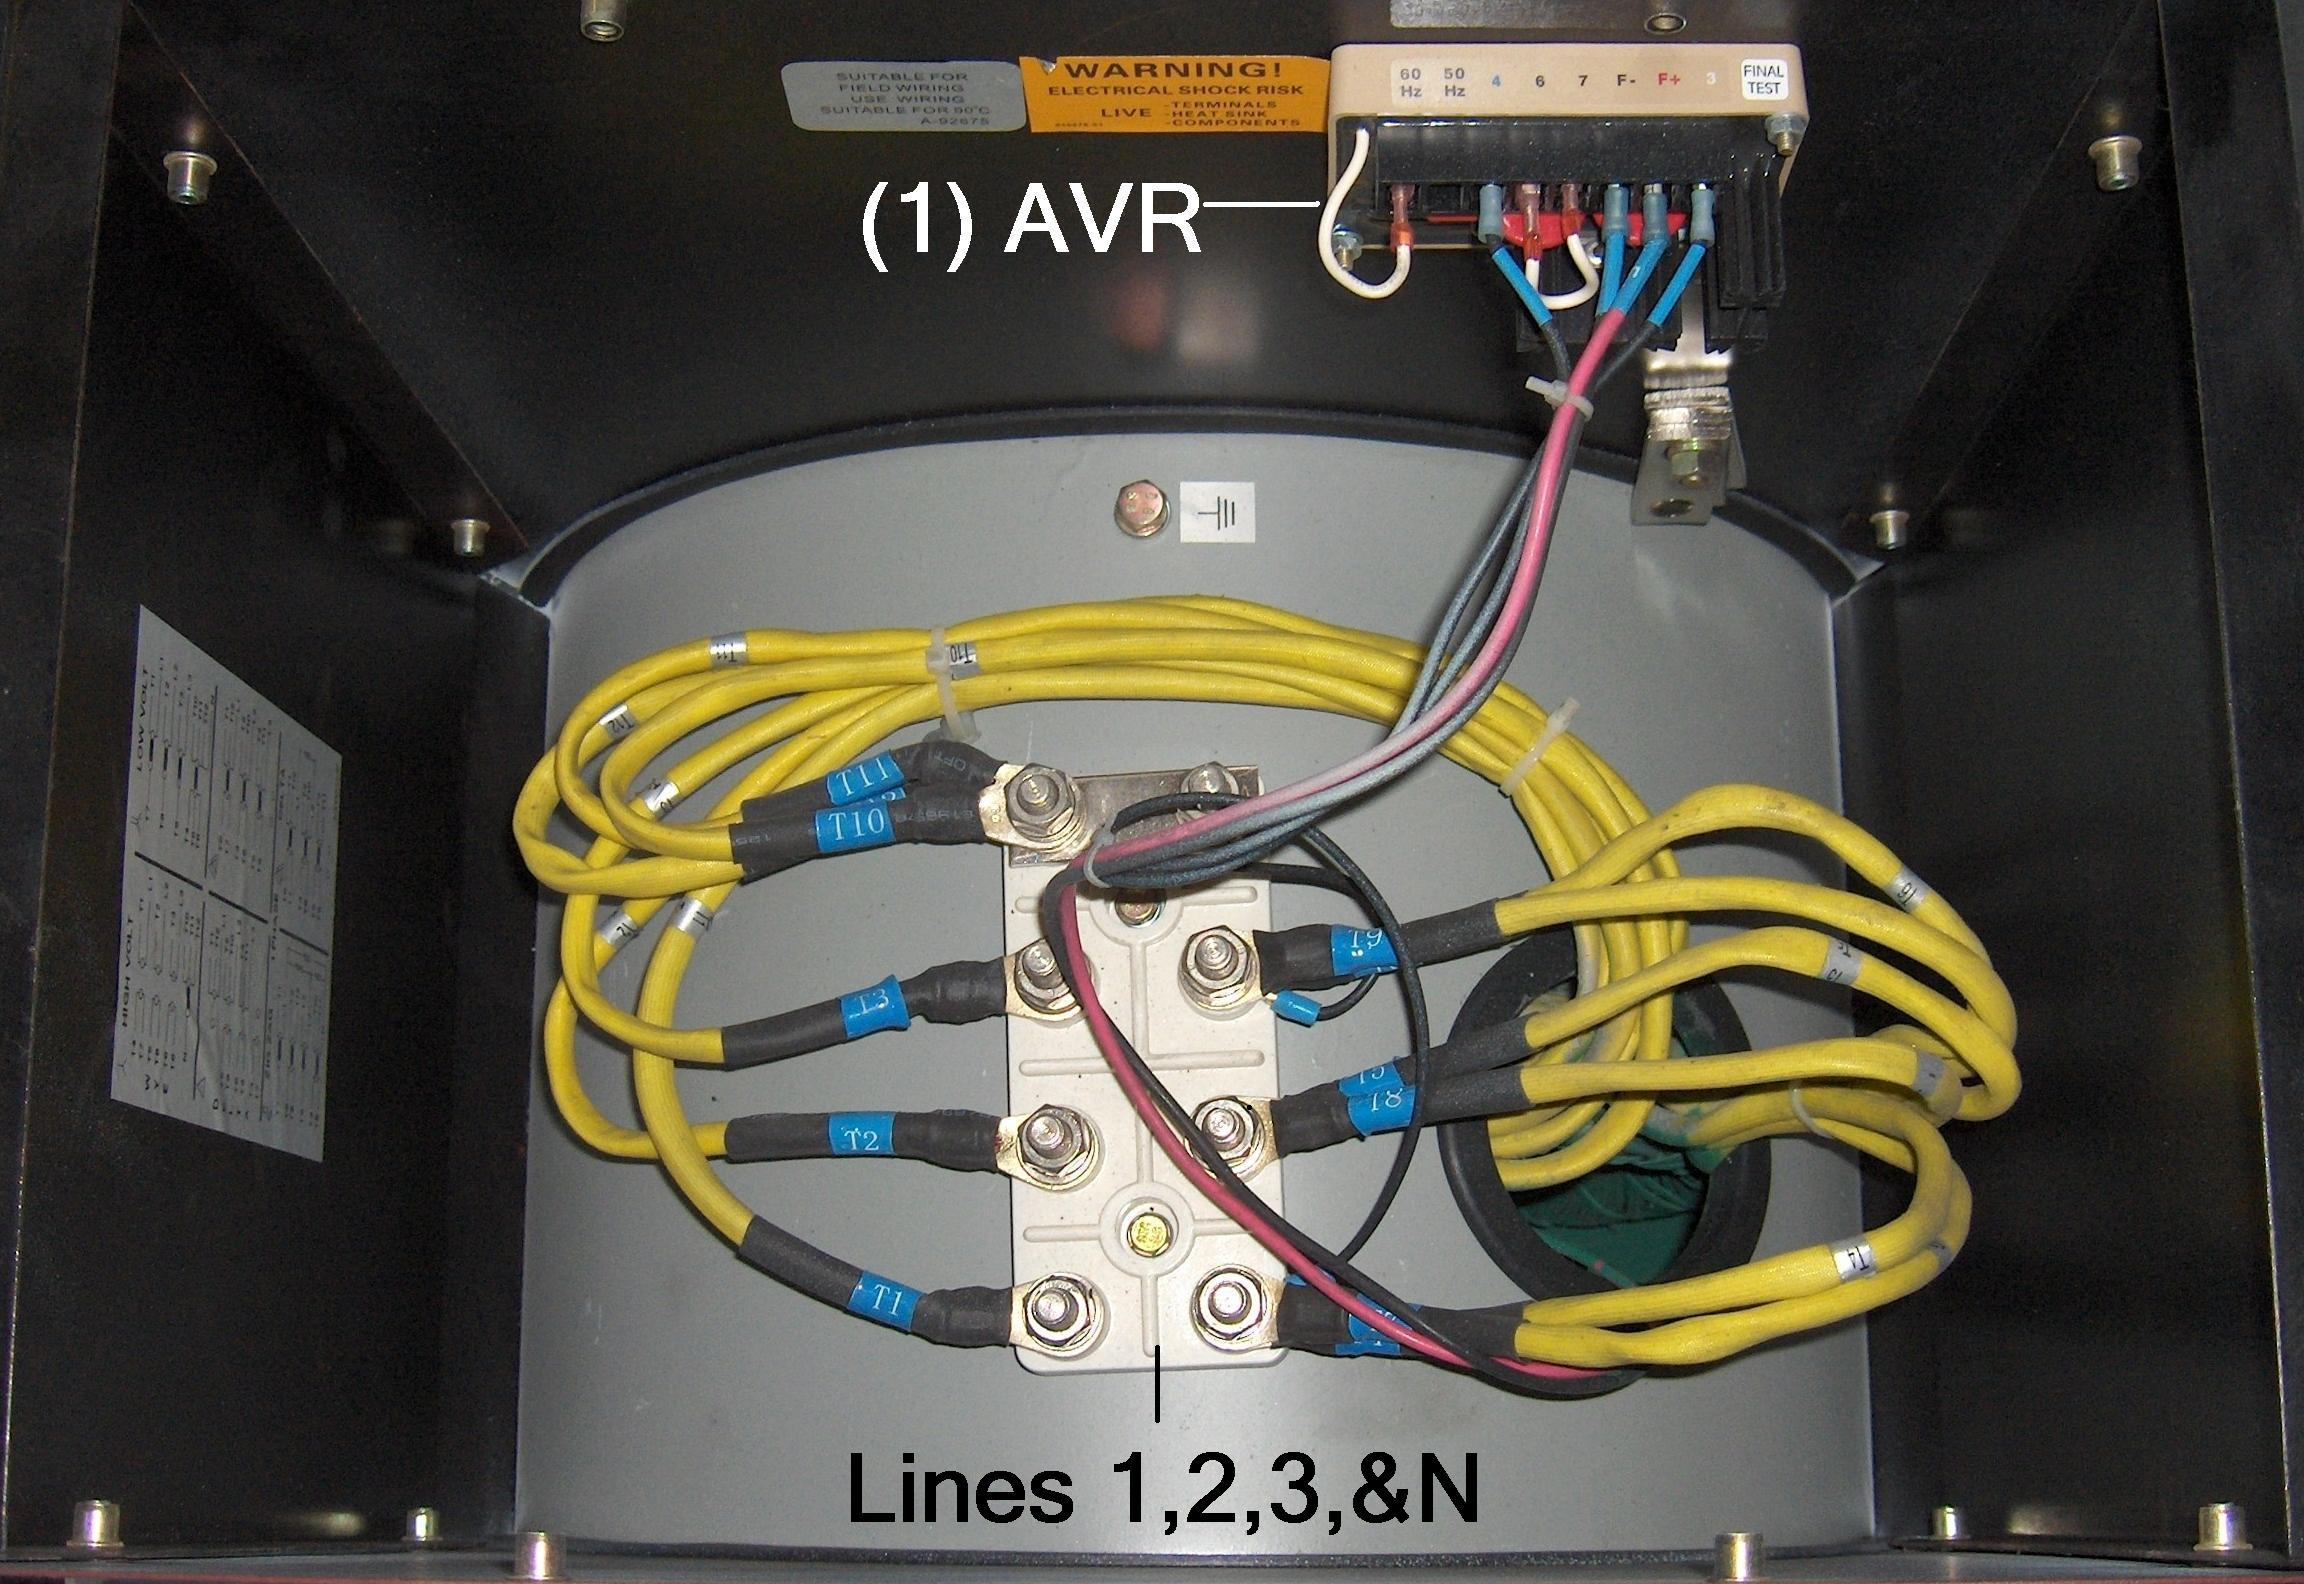 marine wind generator wiring diagram www electrical diagrams power gen merpower technical support 800 777 0714